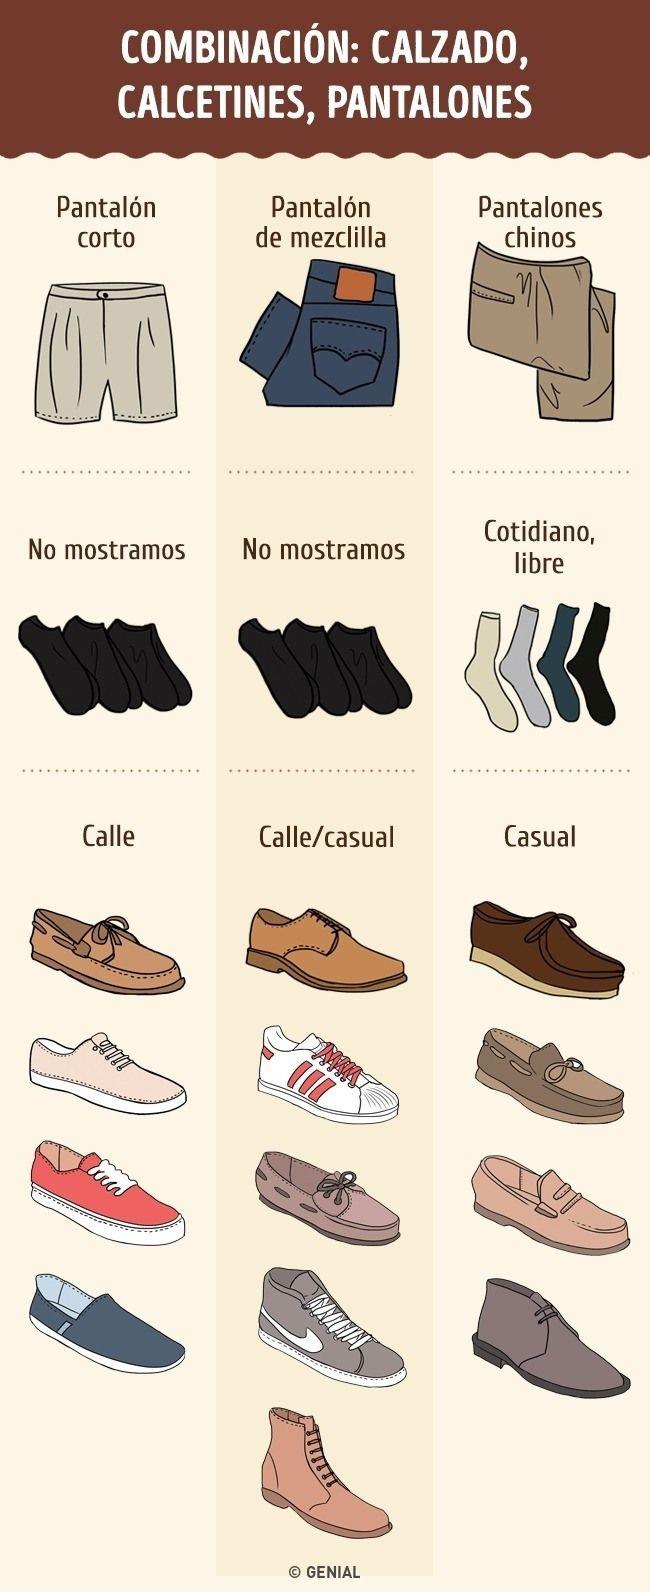 1d5b8296381b4 Infografia cómo combinar zapatos calcetines y pantalones masculinos.   modahombre  infografia  calzadohombre  ropa